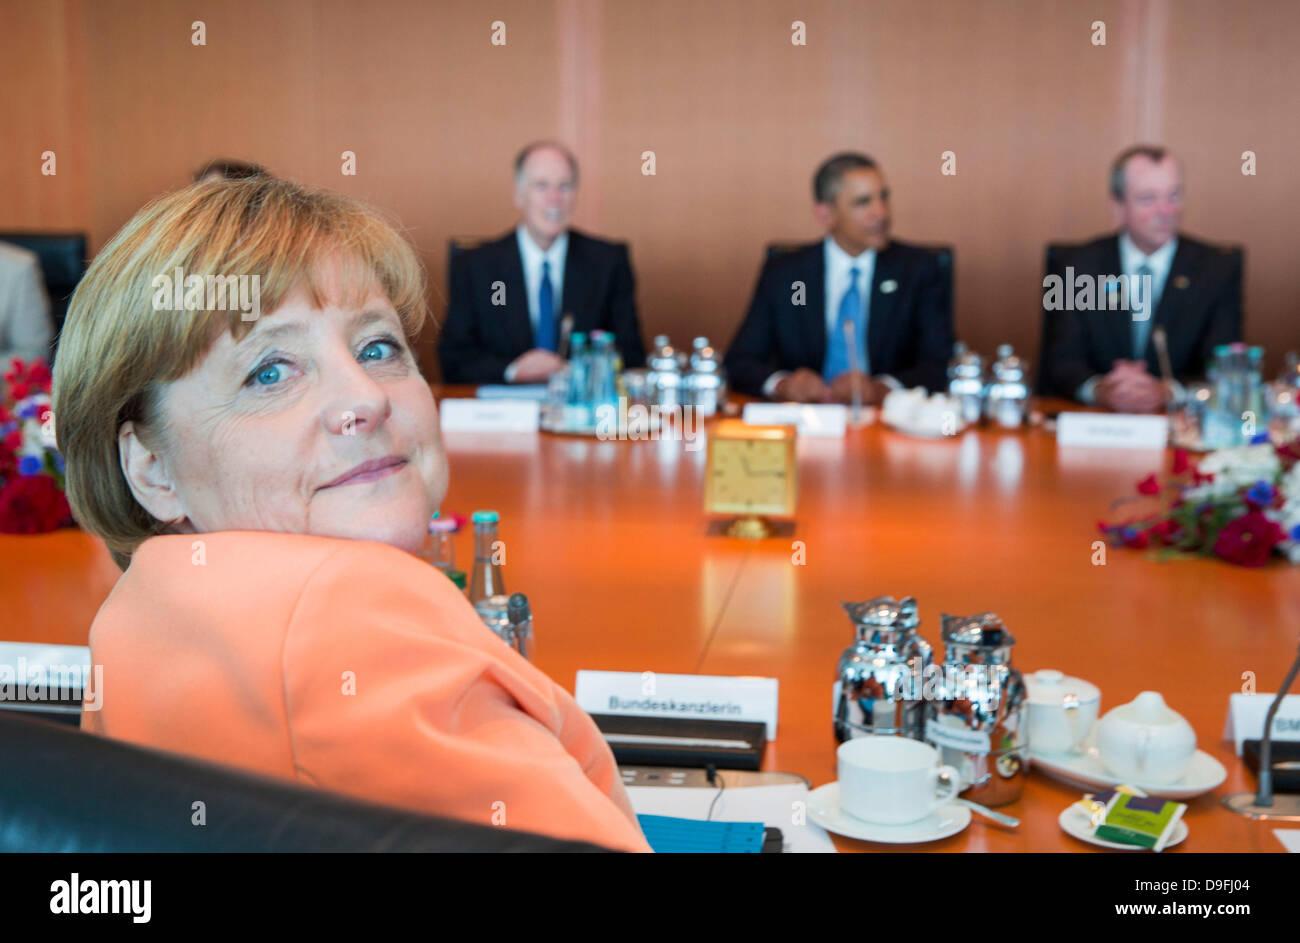 Berlin, Germany. 19th June, 2013. From left, German Chancellor Angela Merkel, National Security Advisor Thomas Donilon, - Stock Image